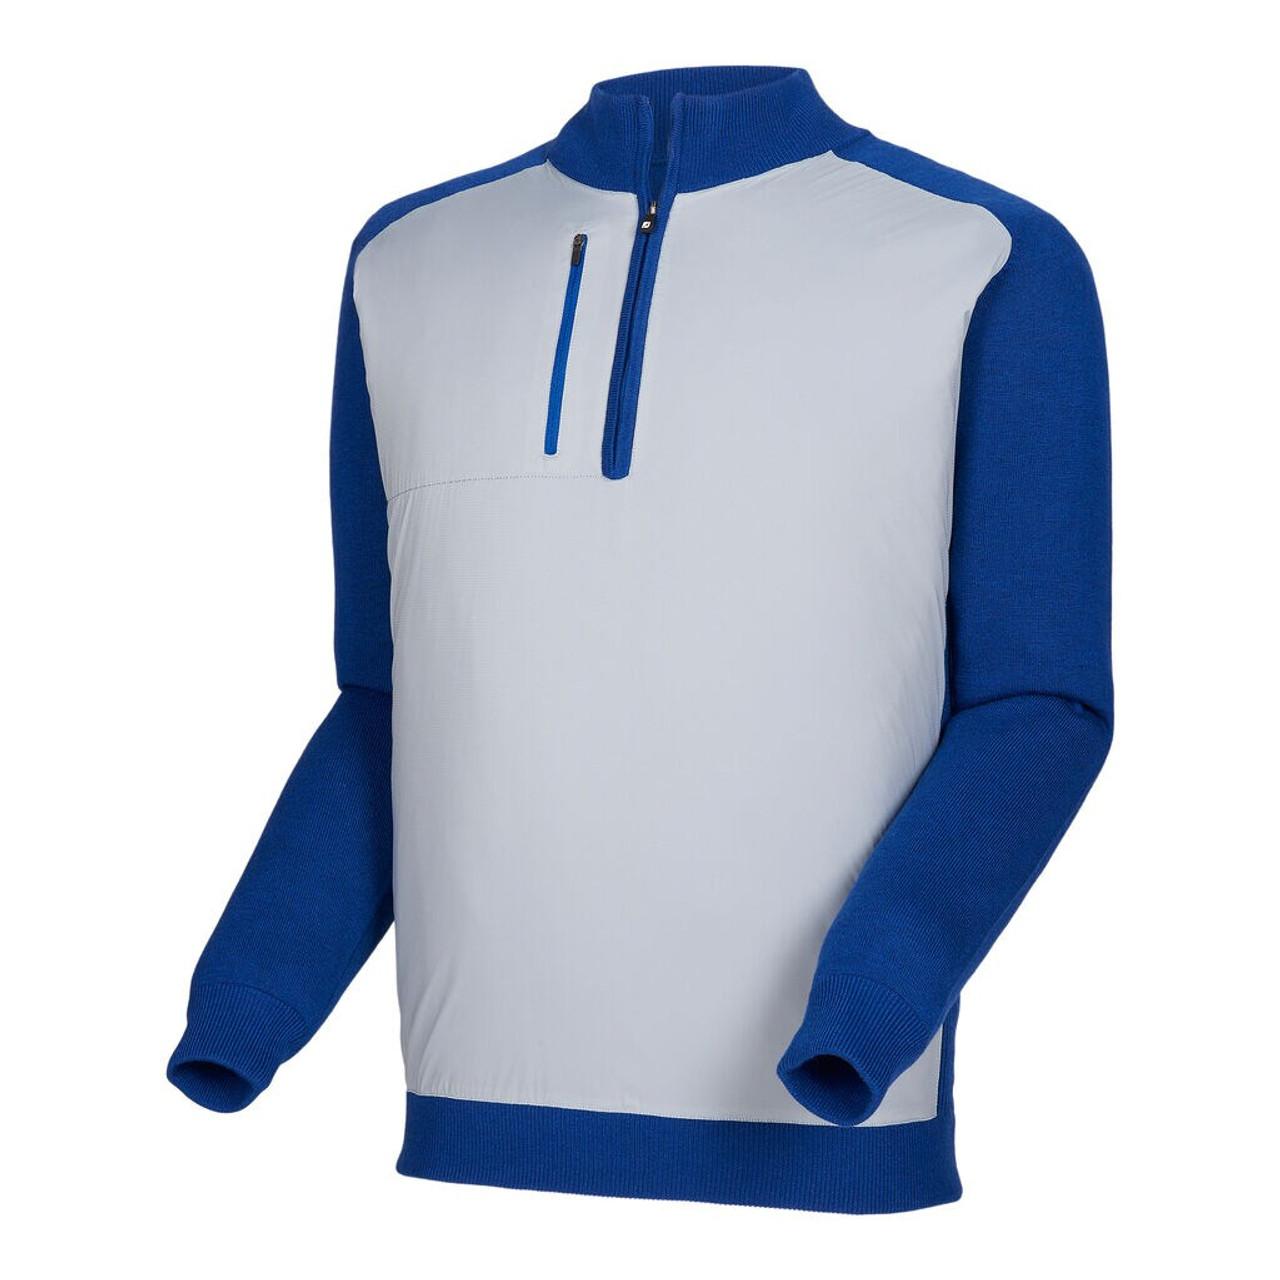 FootJoy Tech Sweater - Navy / Heather Grey (25071)